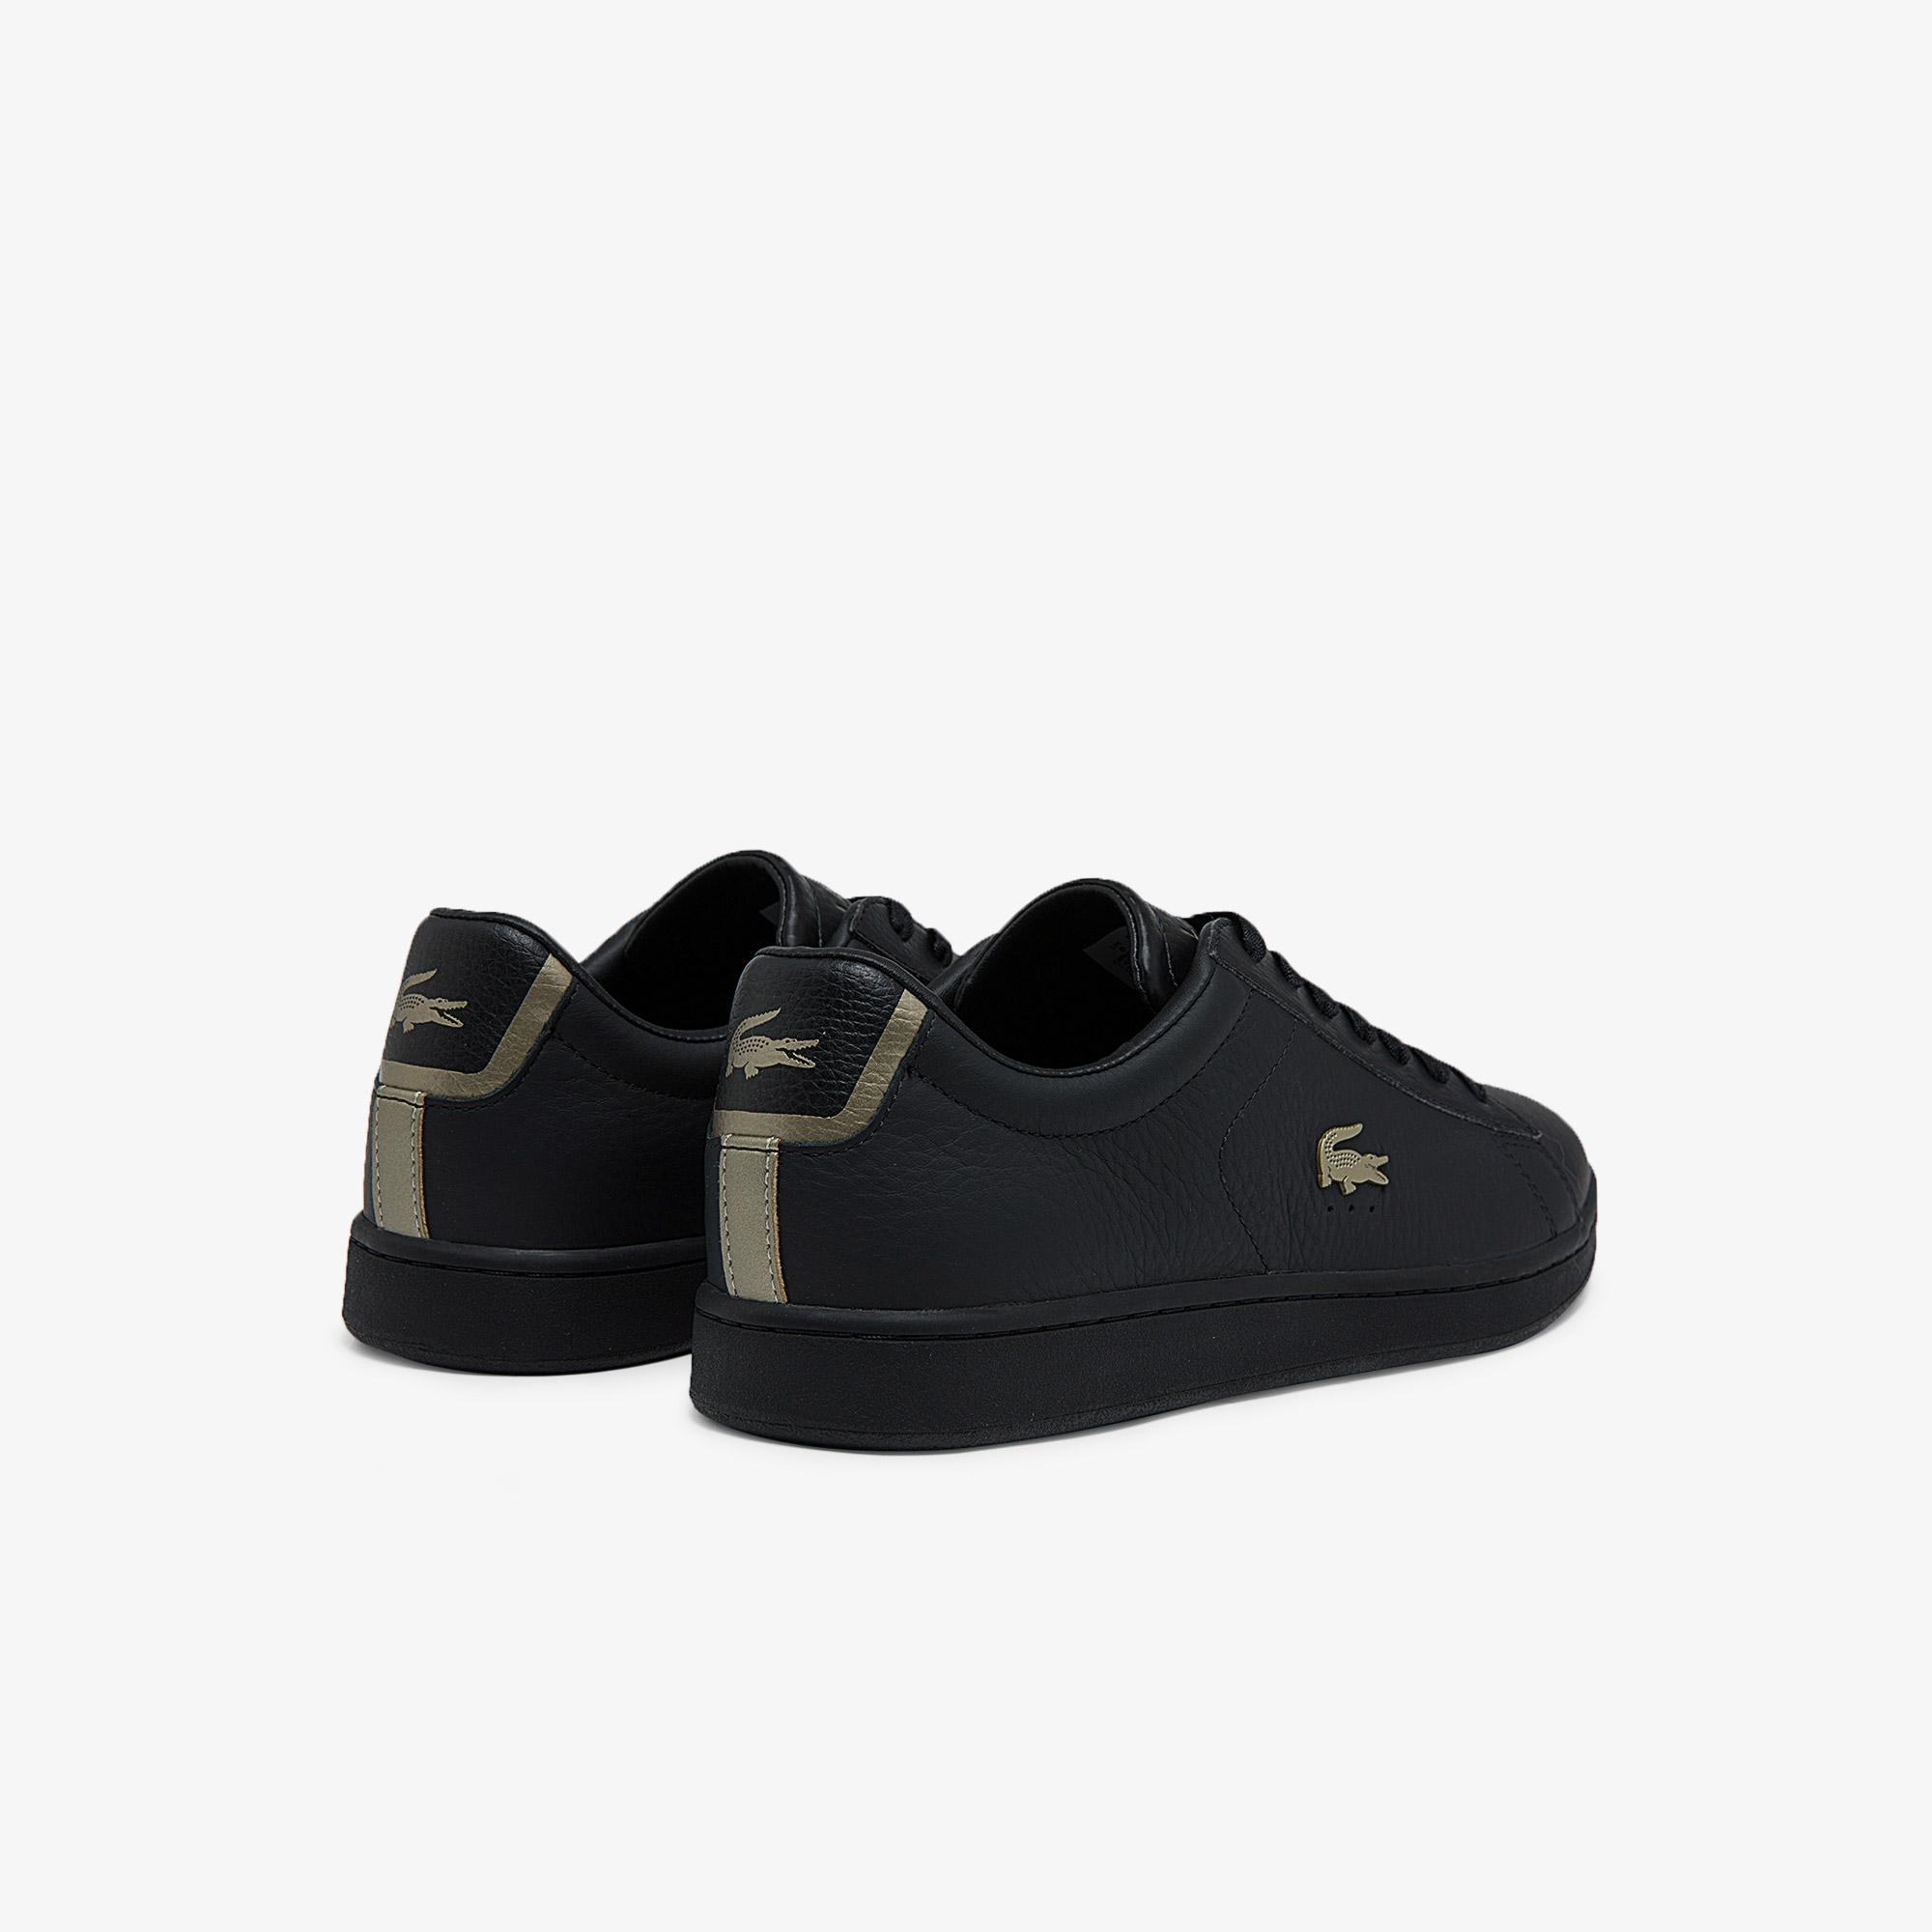 Lacoste кросівки чоловічі Carnaby Evo